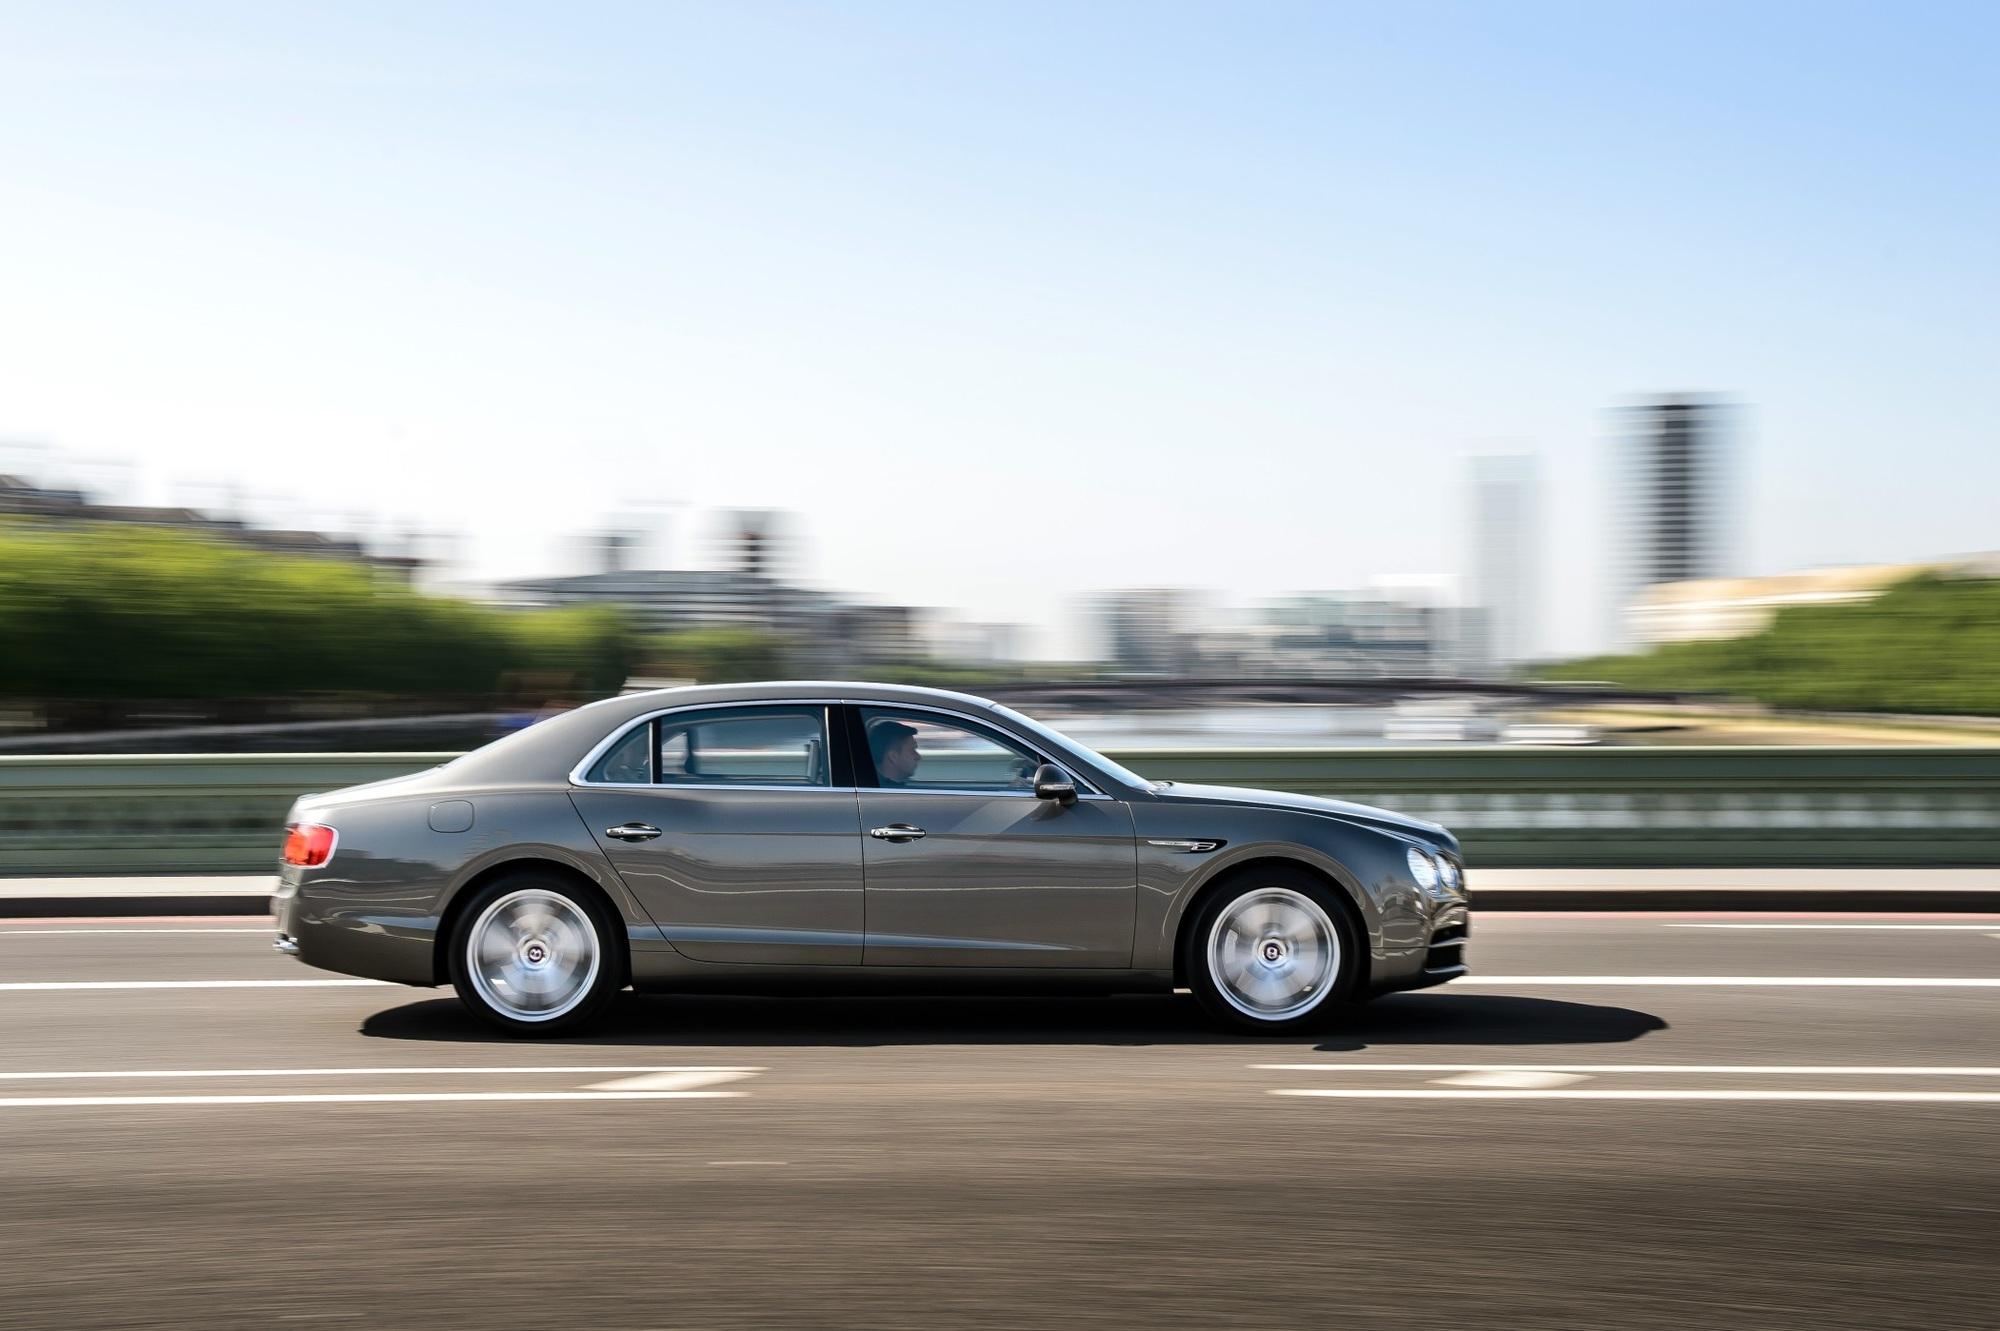 Fahrbericht: Bentley Flying Spur V8 - Sahnetorte mit Süßstoff